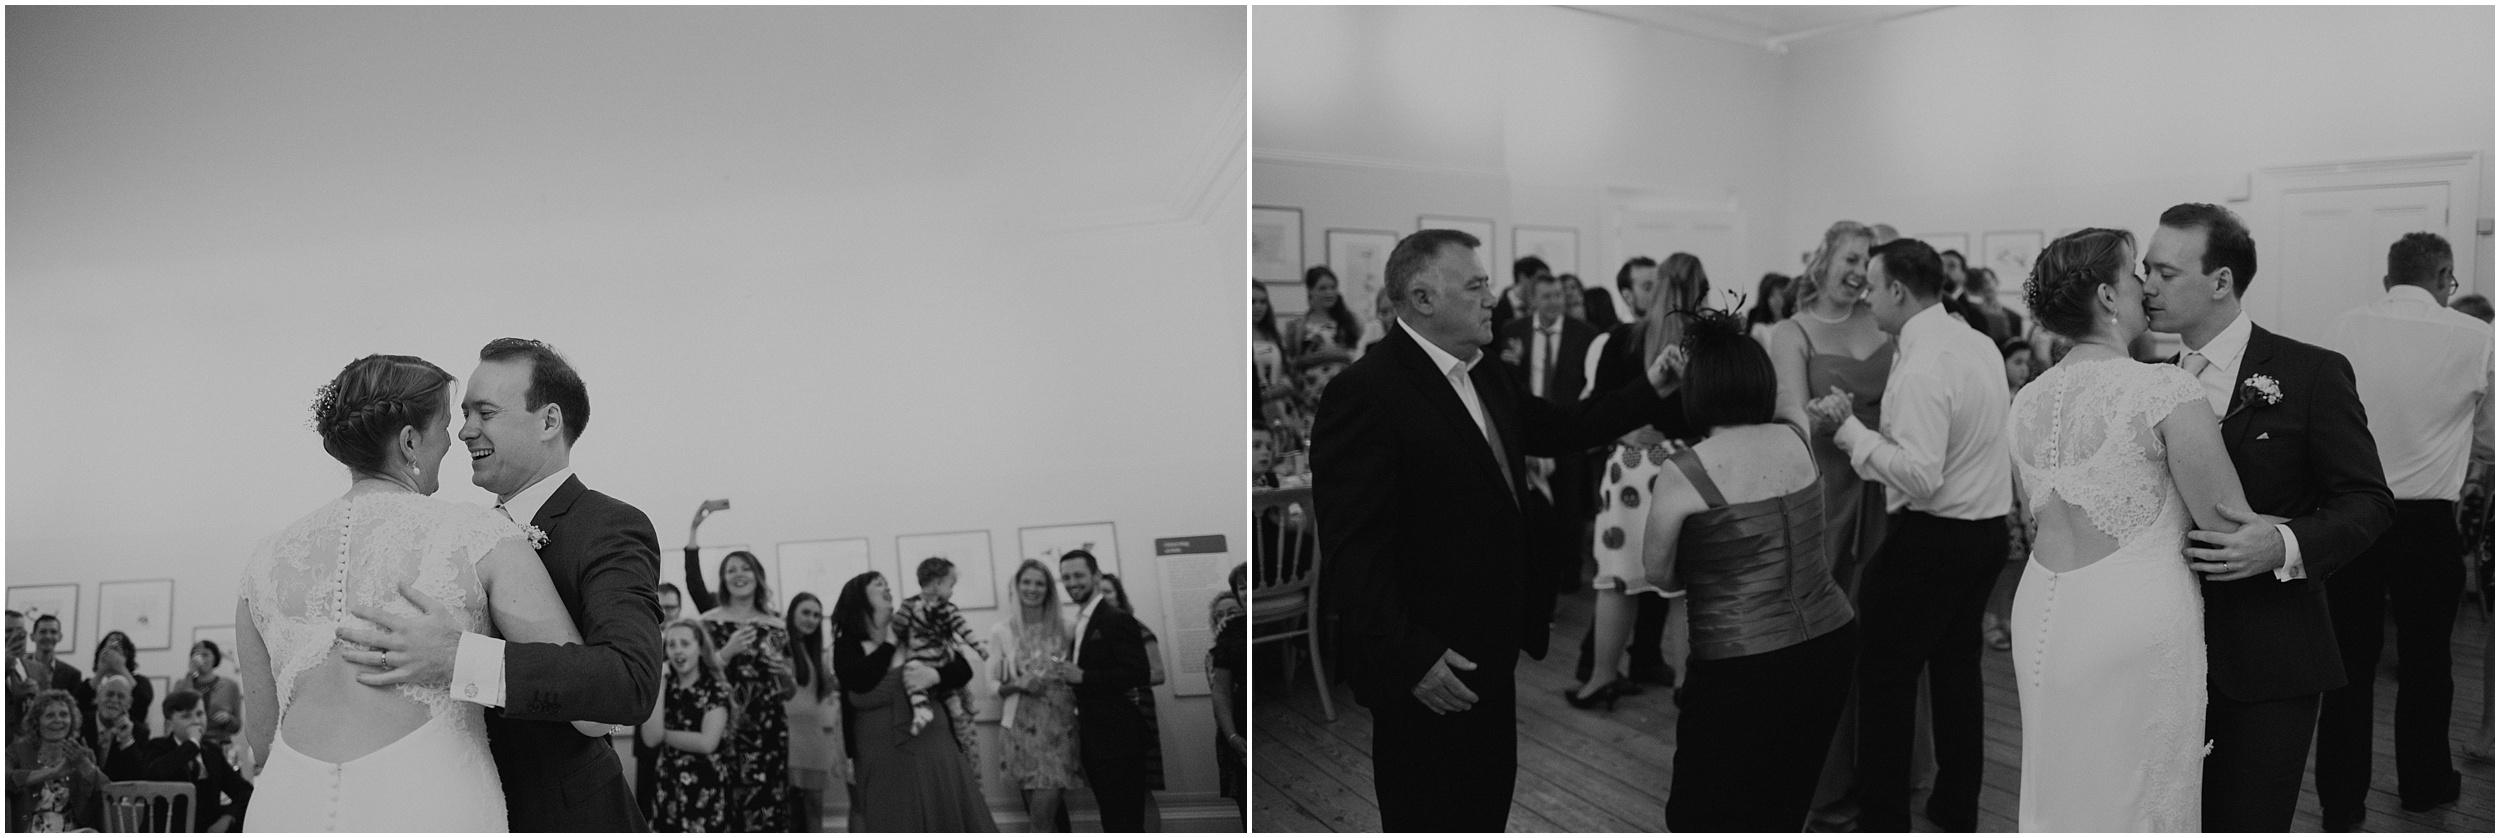 6-Libby&Tim_reception-57.jpg